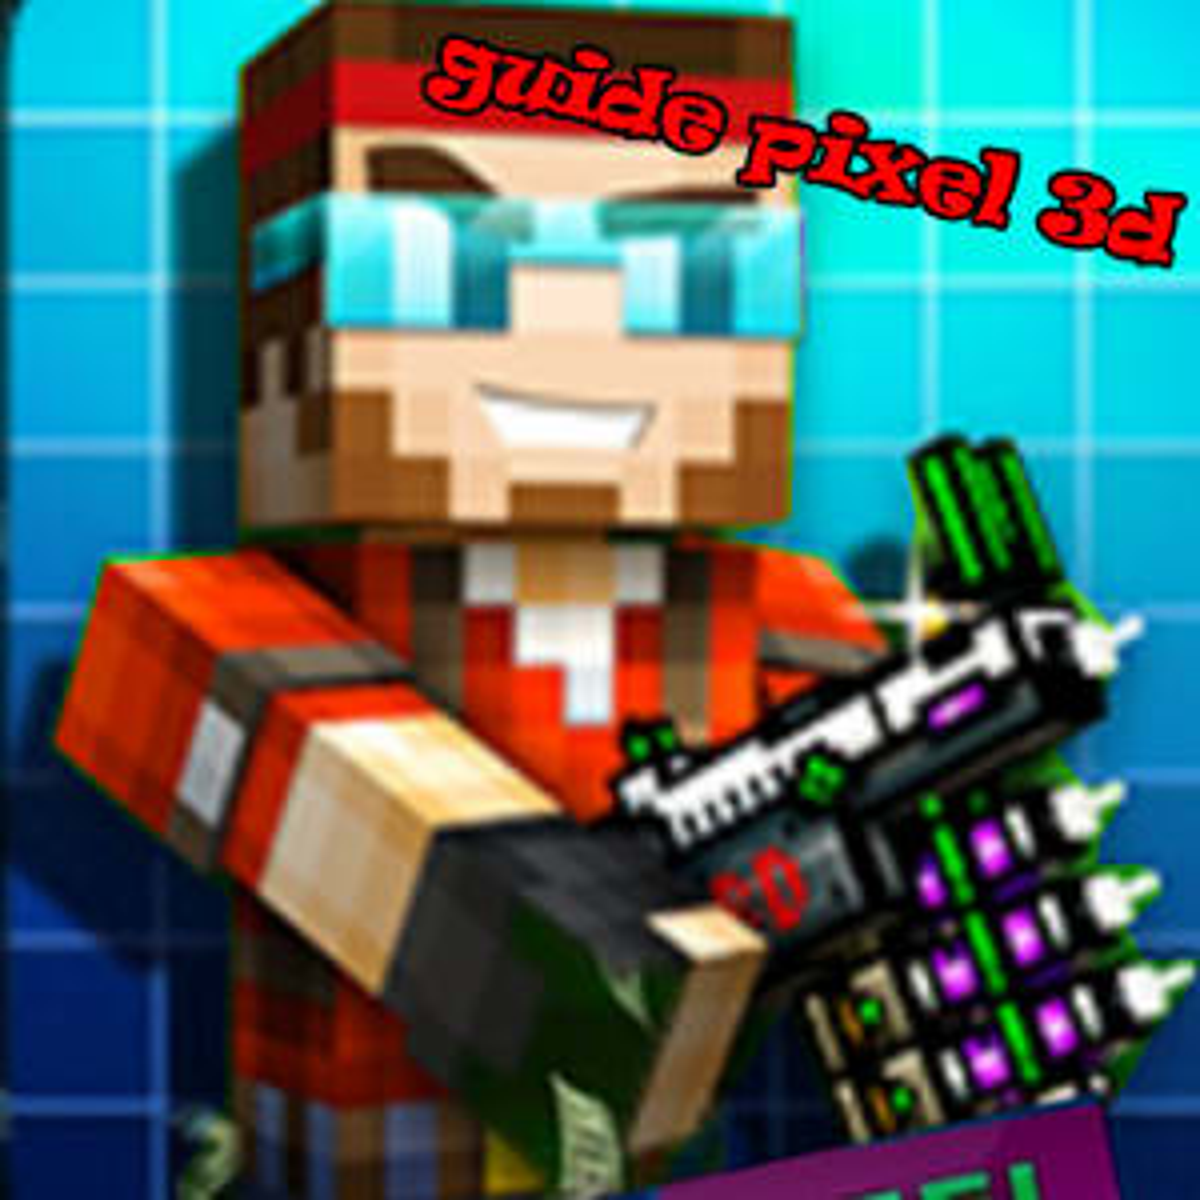 Guide For Pixel Gun 3D free